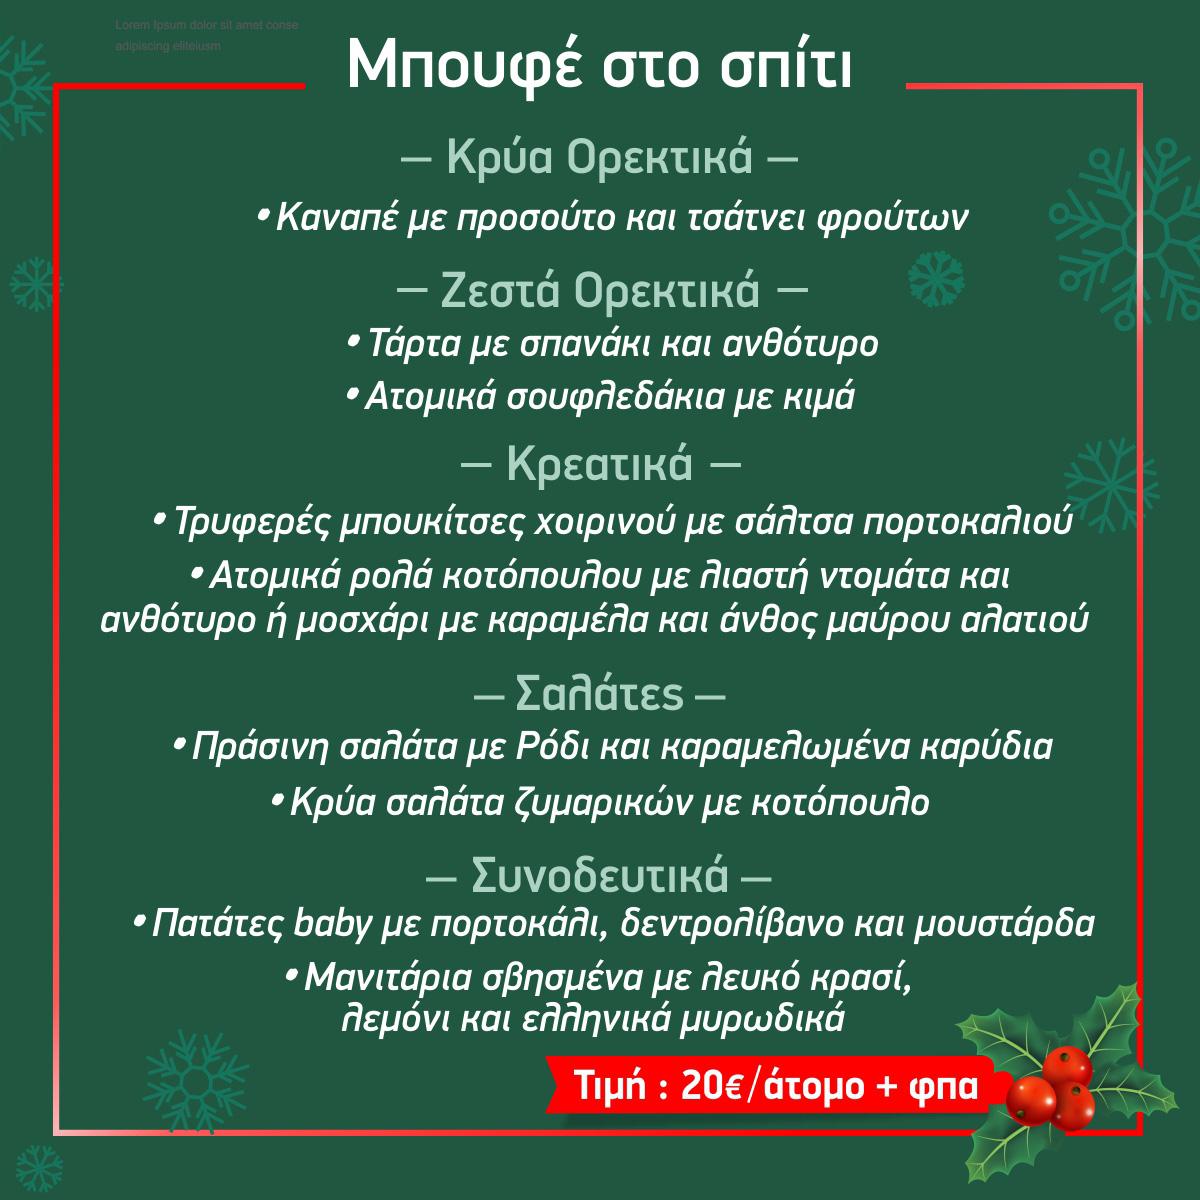 moufe_spiti_xmas